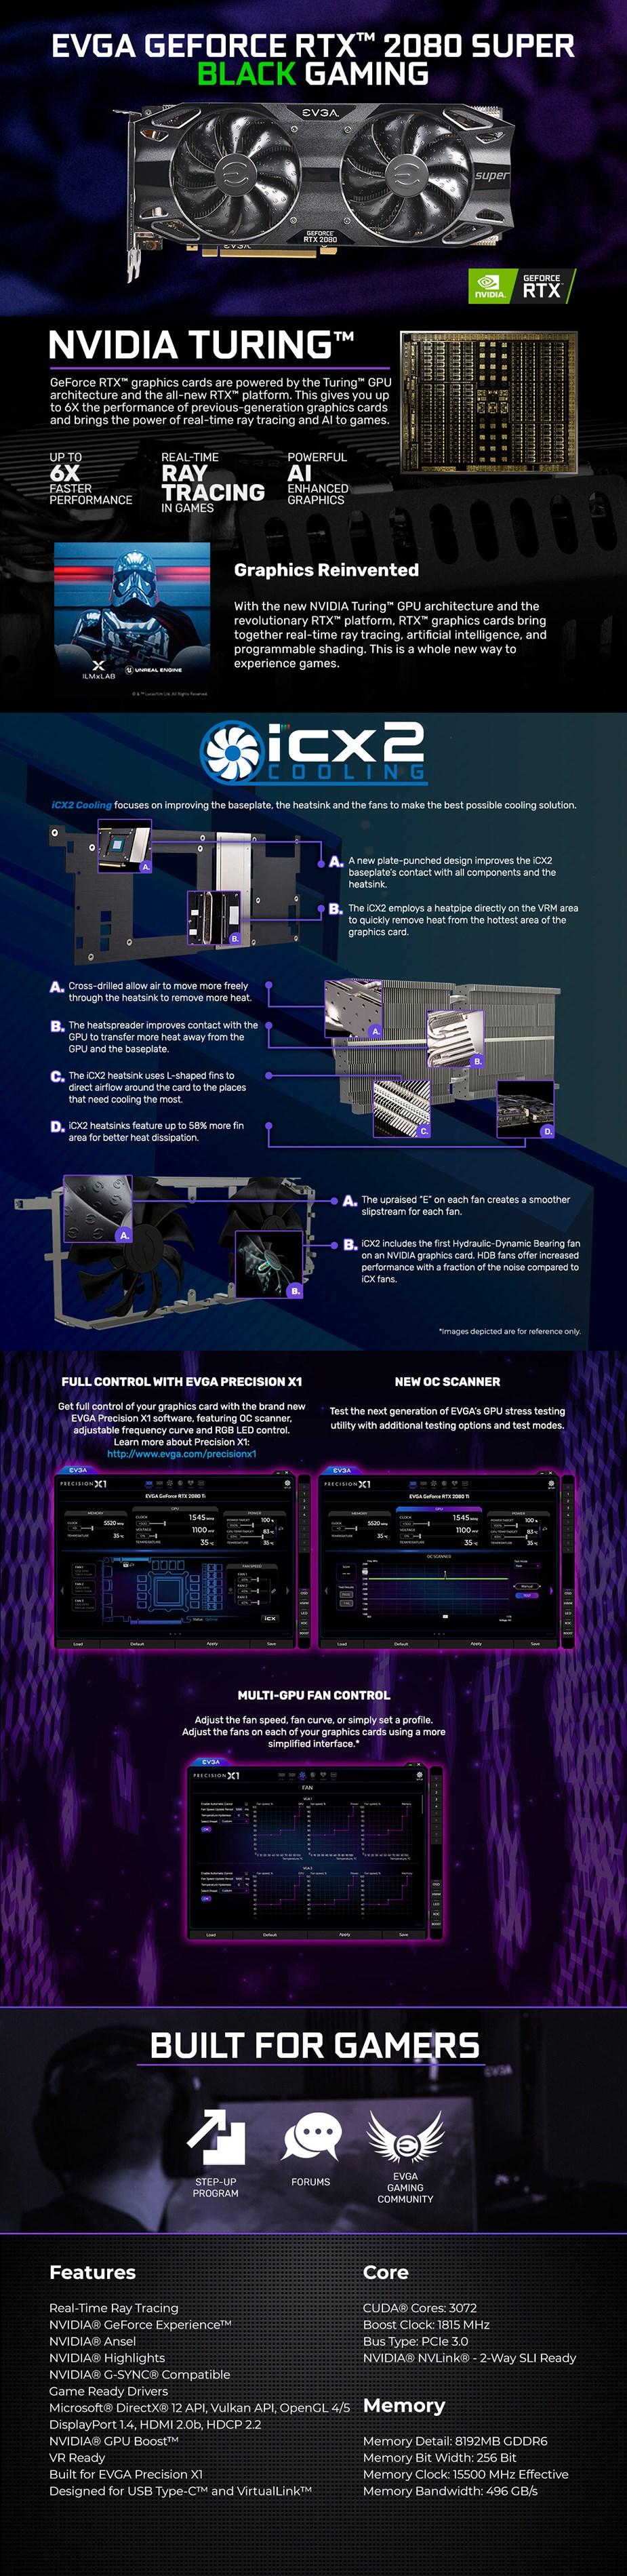 EVGA GeForce RTX 2080 SUPER BLACK GAMNIG 8GB Video Card - Overview 1